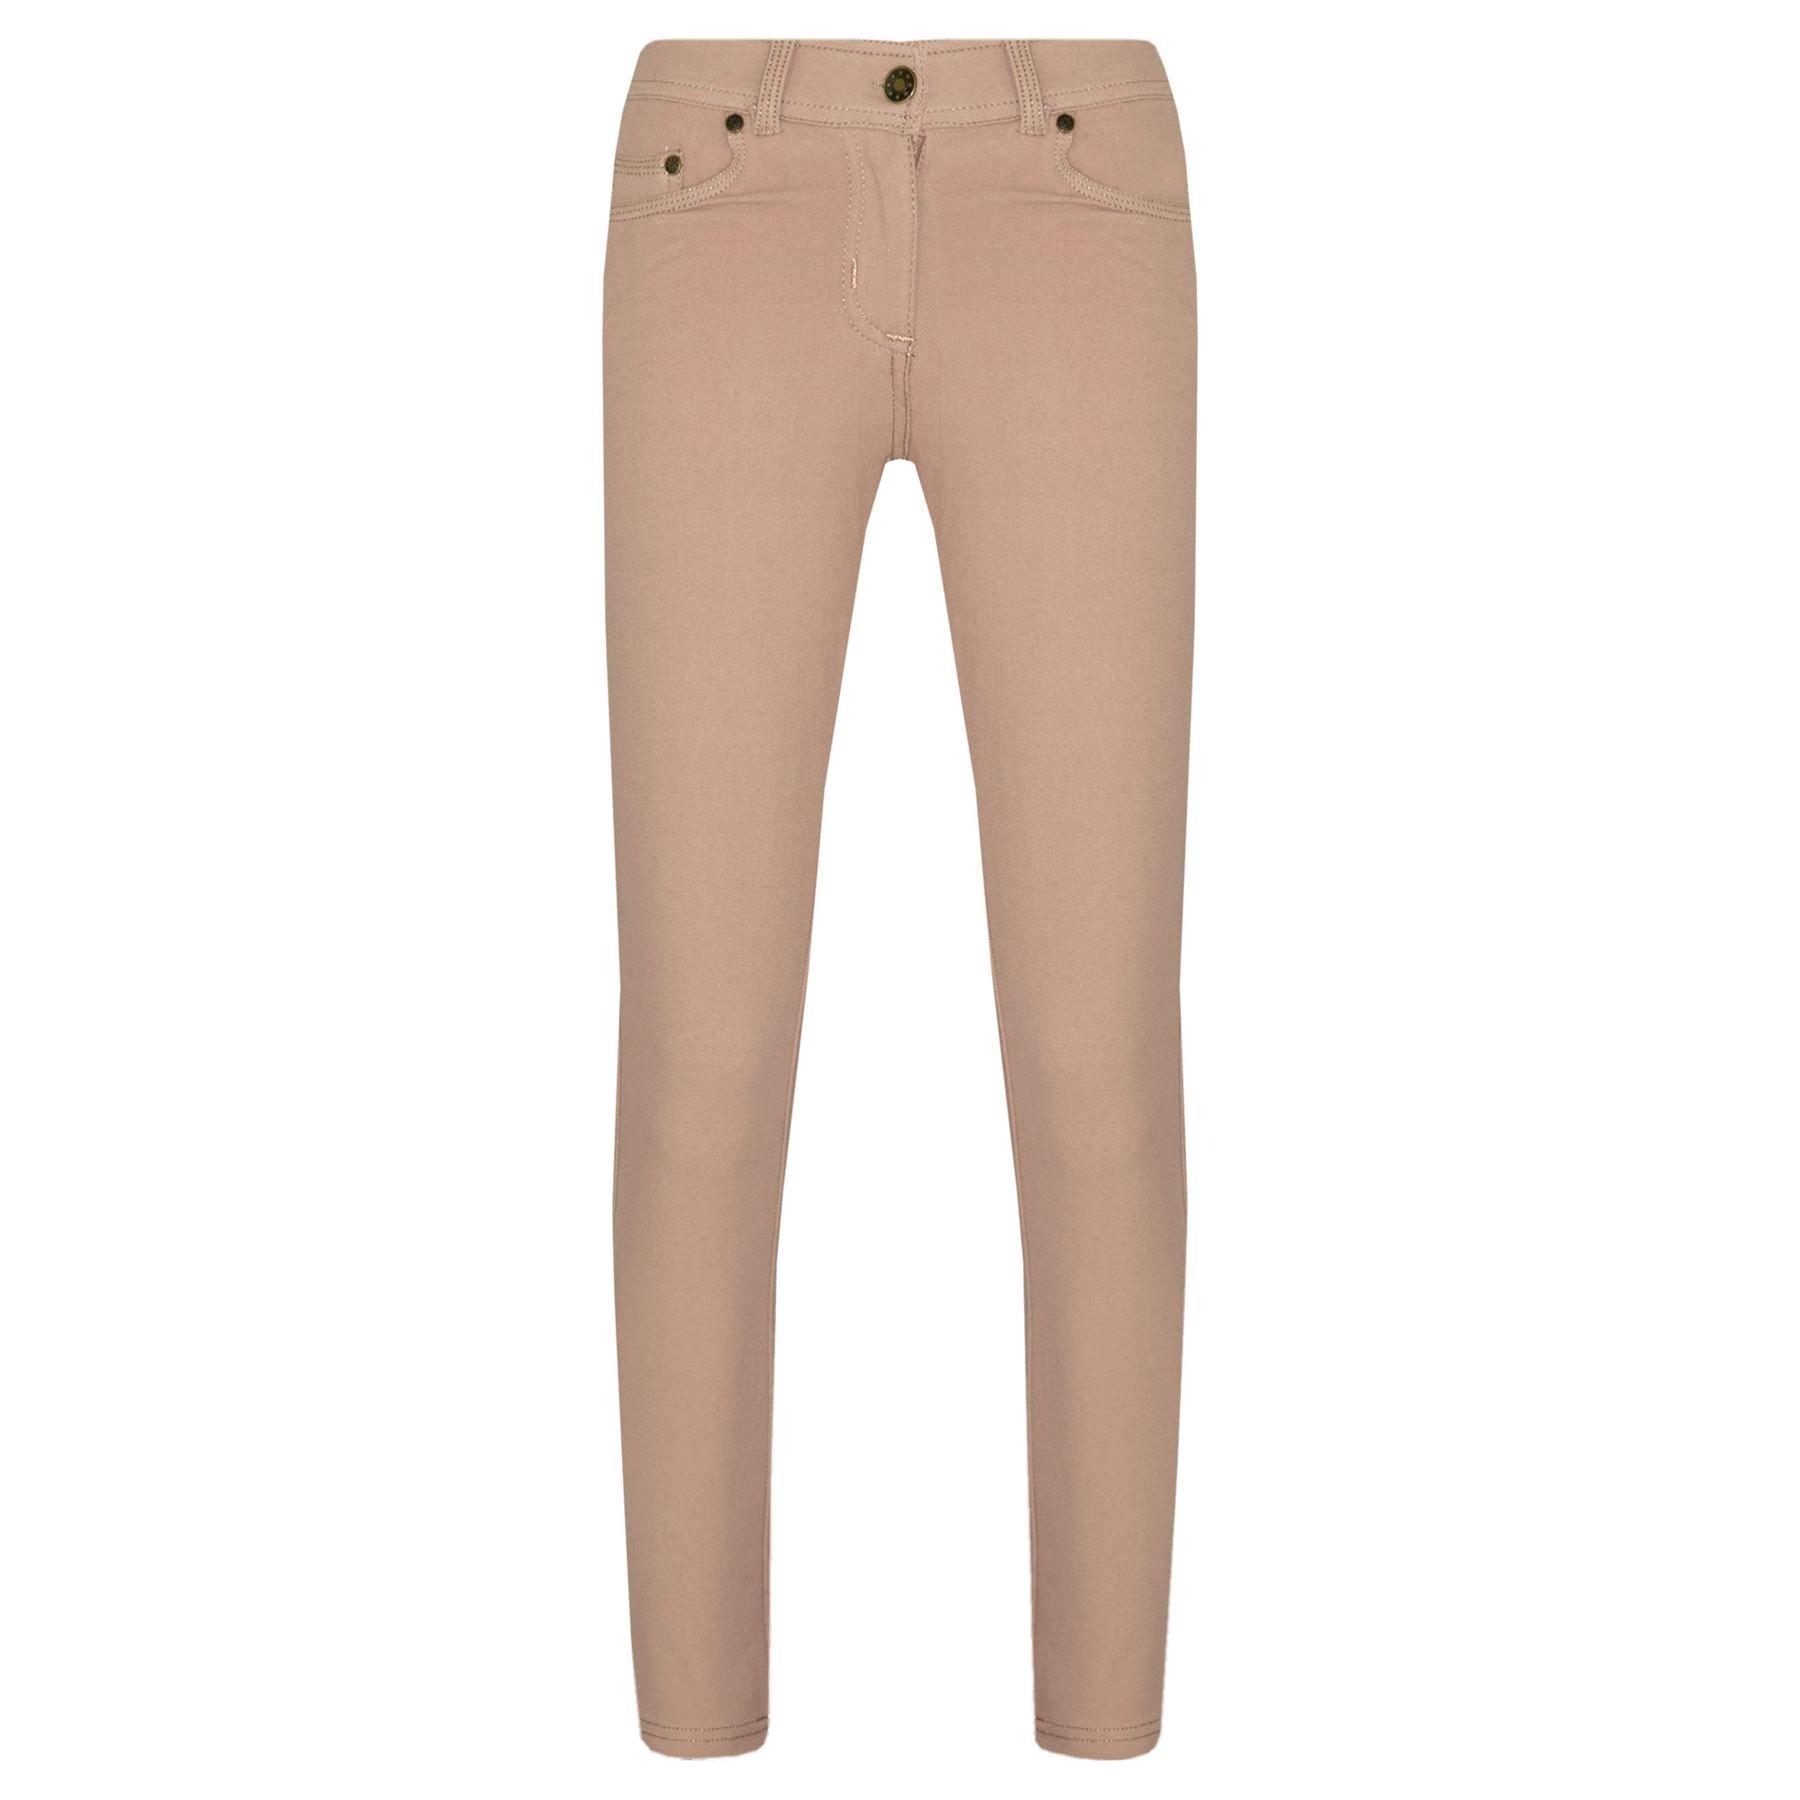 A2Z 4 Kids® Girls Skinny Jeans Kids Stone Stretchy Denim Jeggings Fit Pants Trousers 5-13 Yr